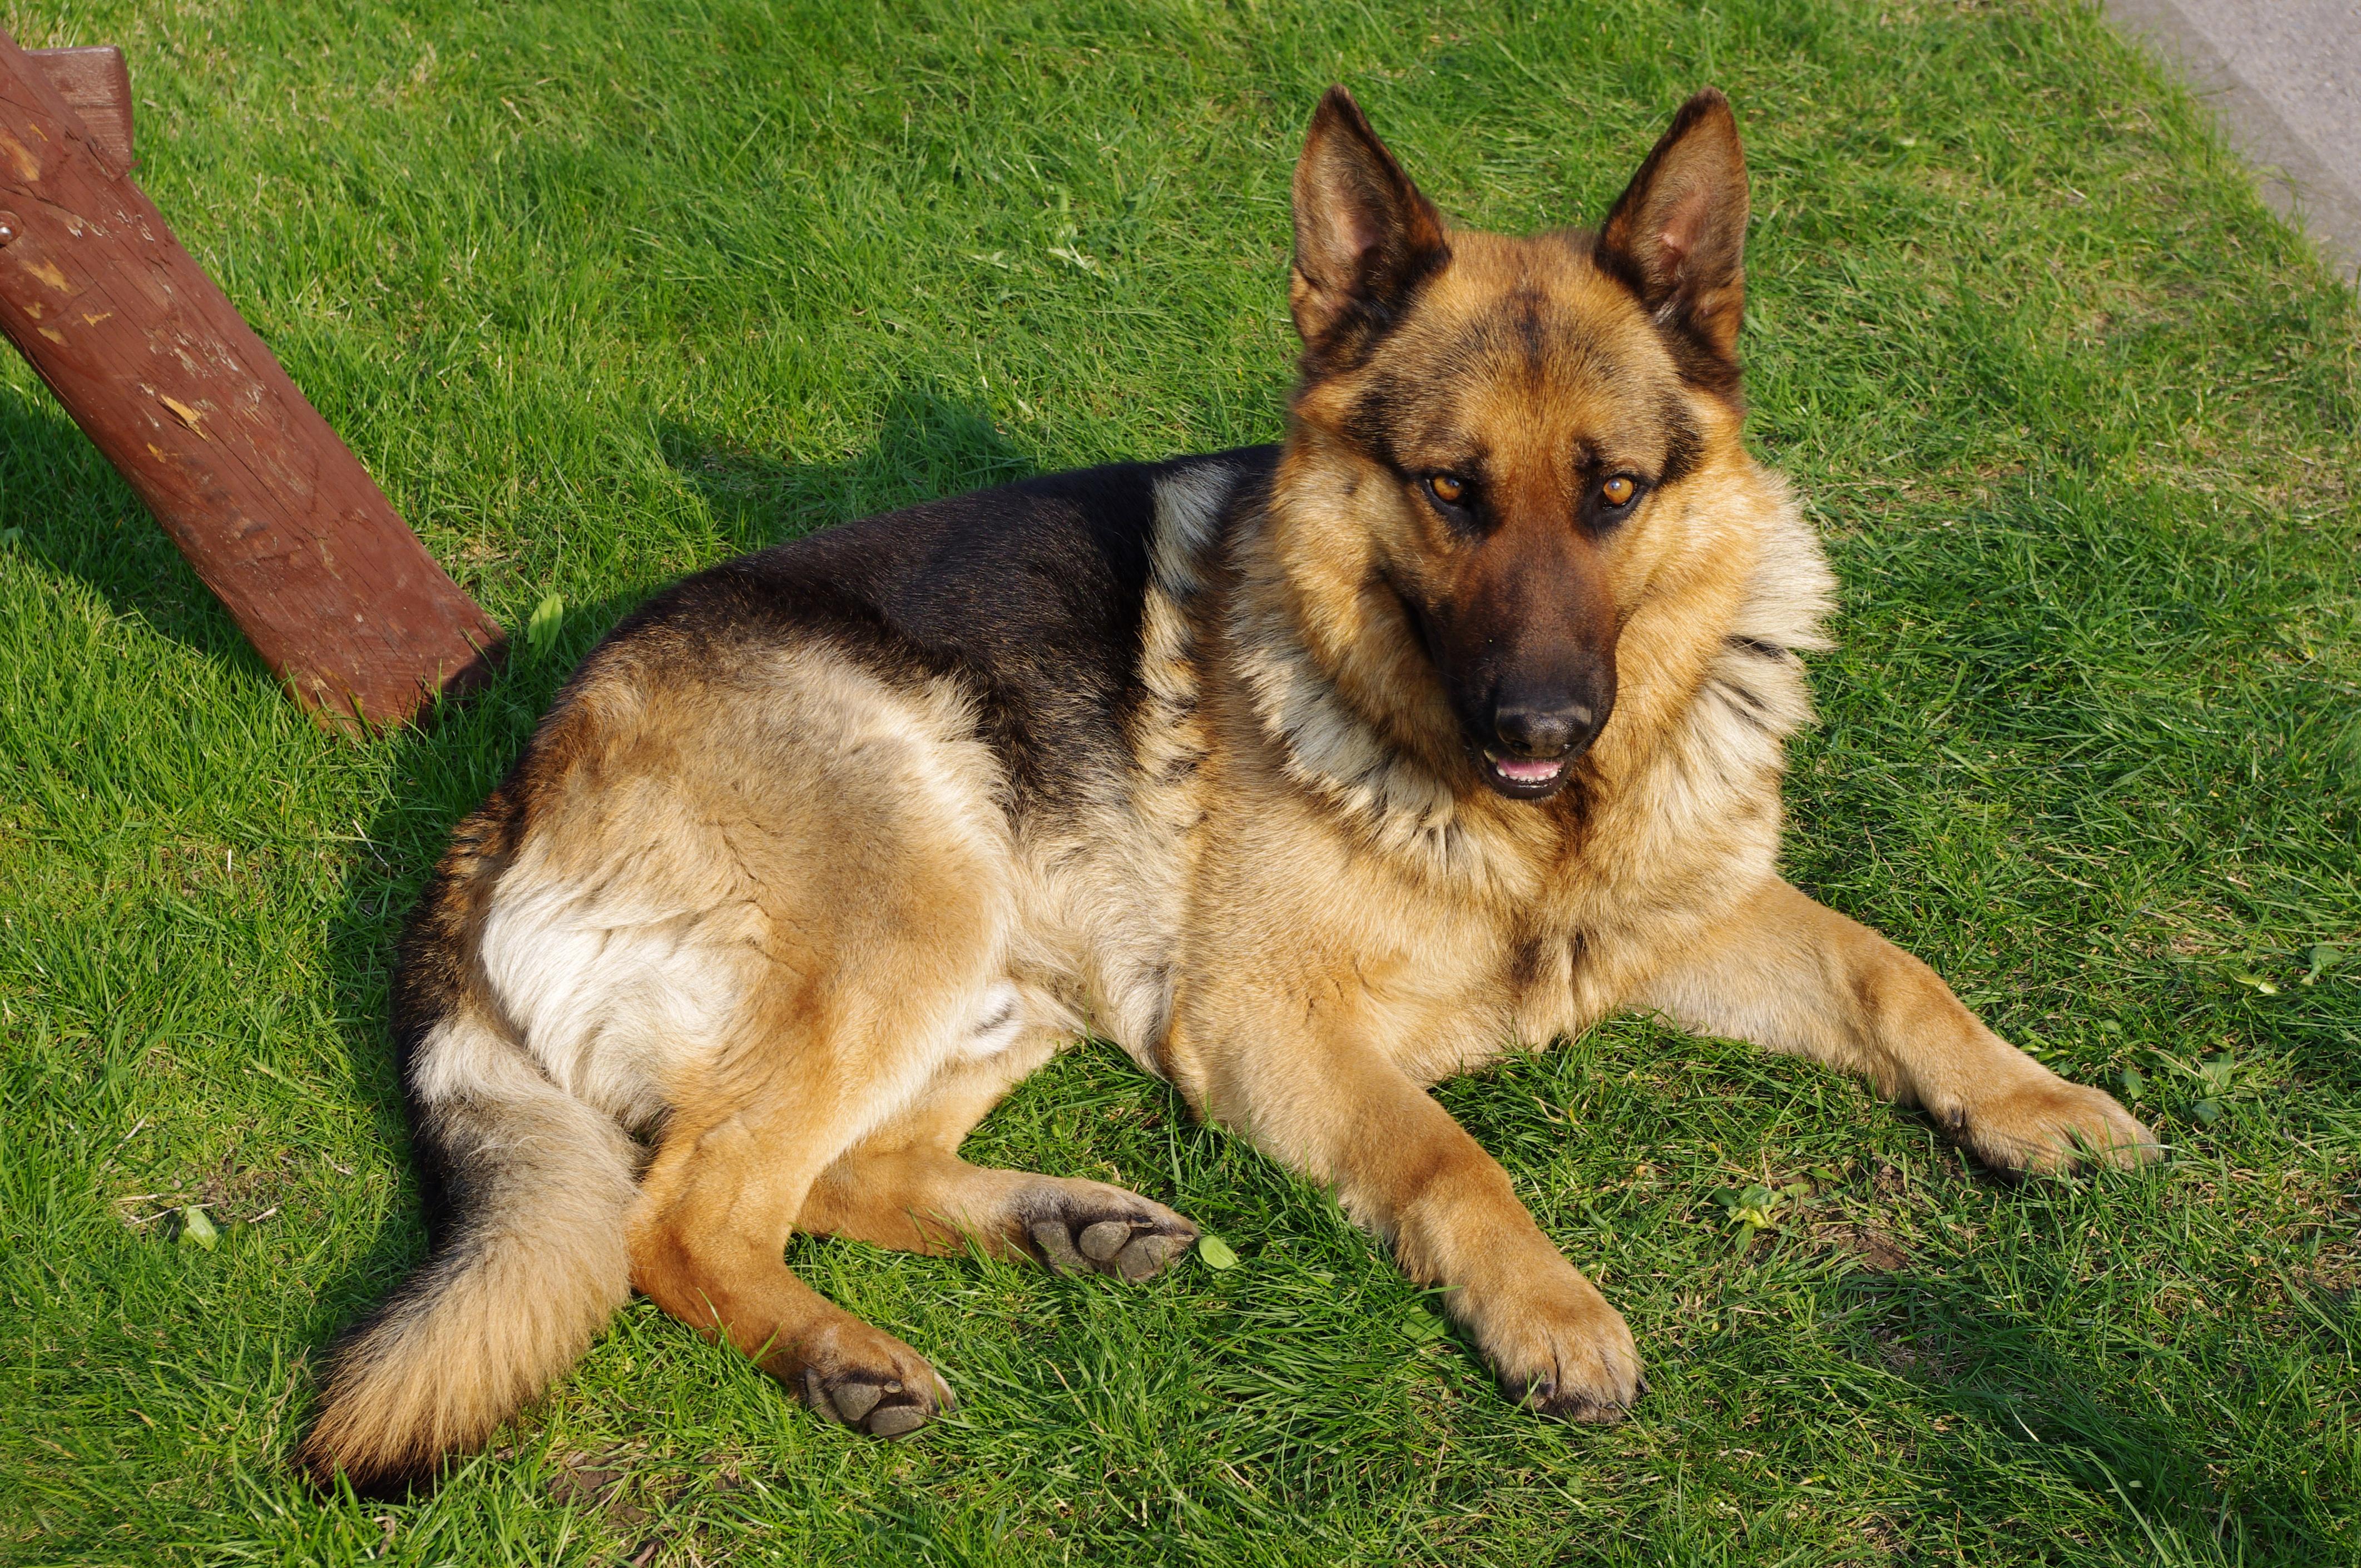 File:20110425 German Shepherd Dog 8505.jpg - Wikimedia Commons